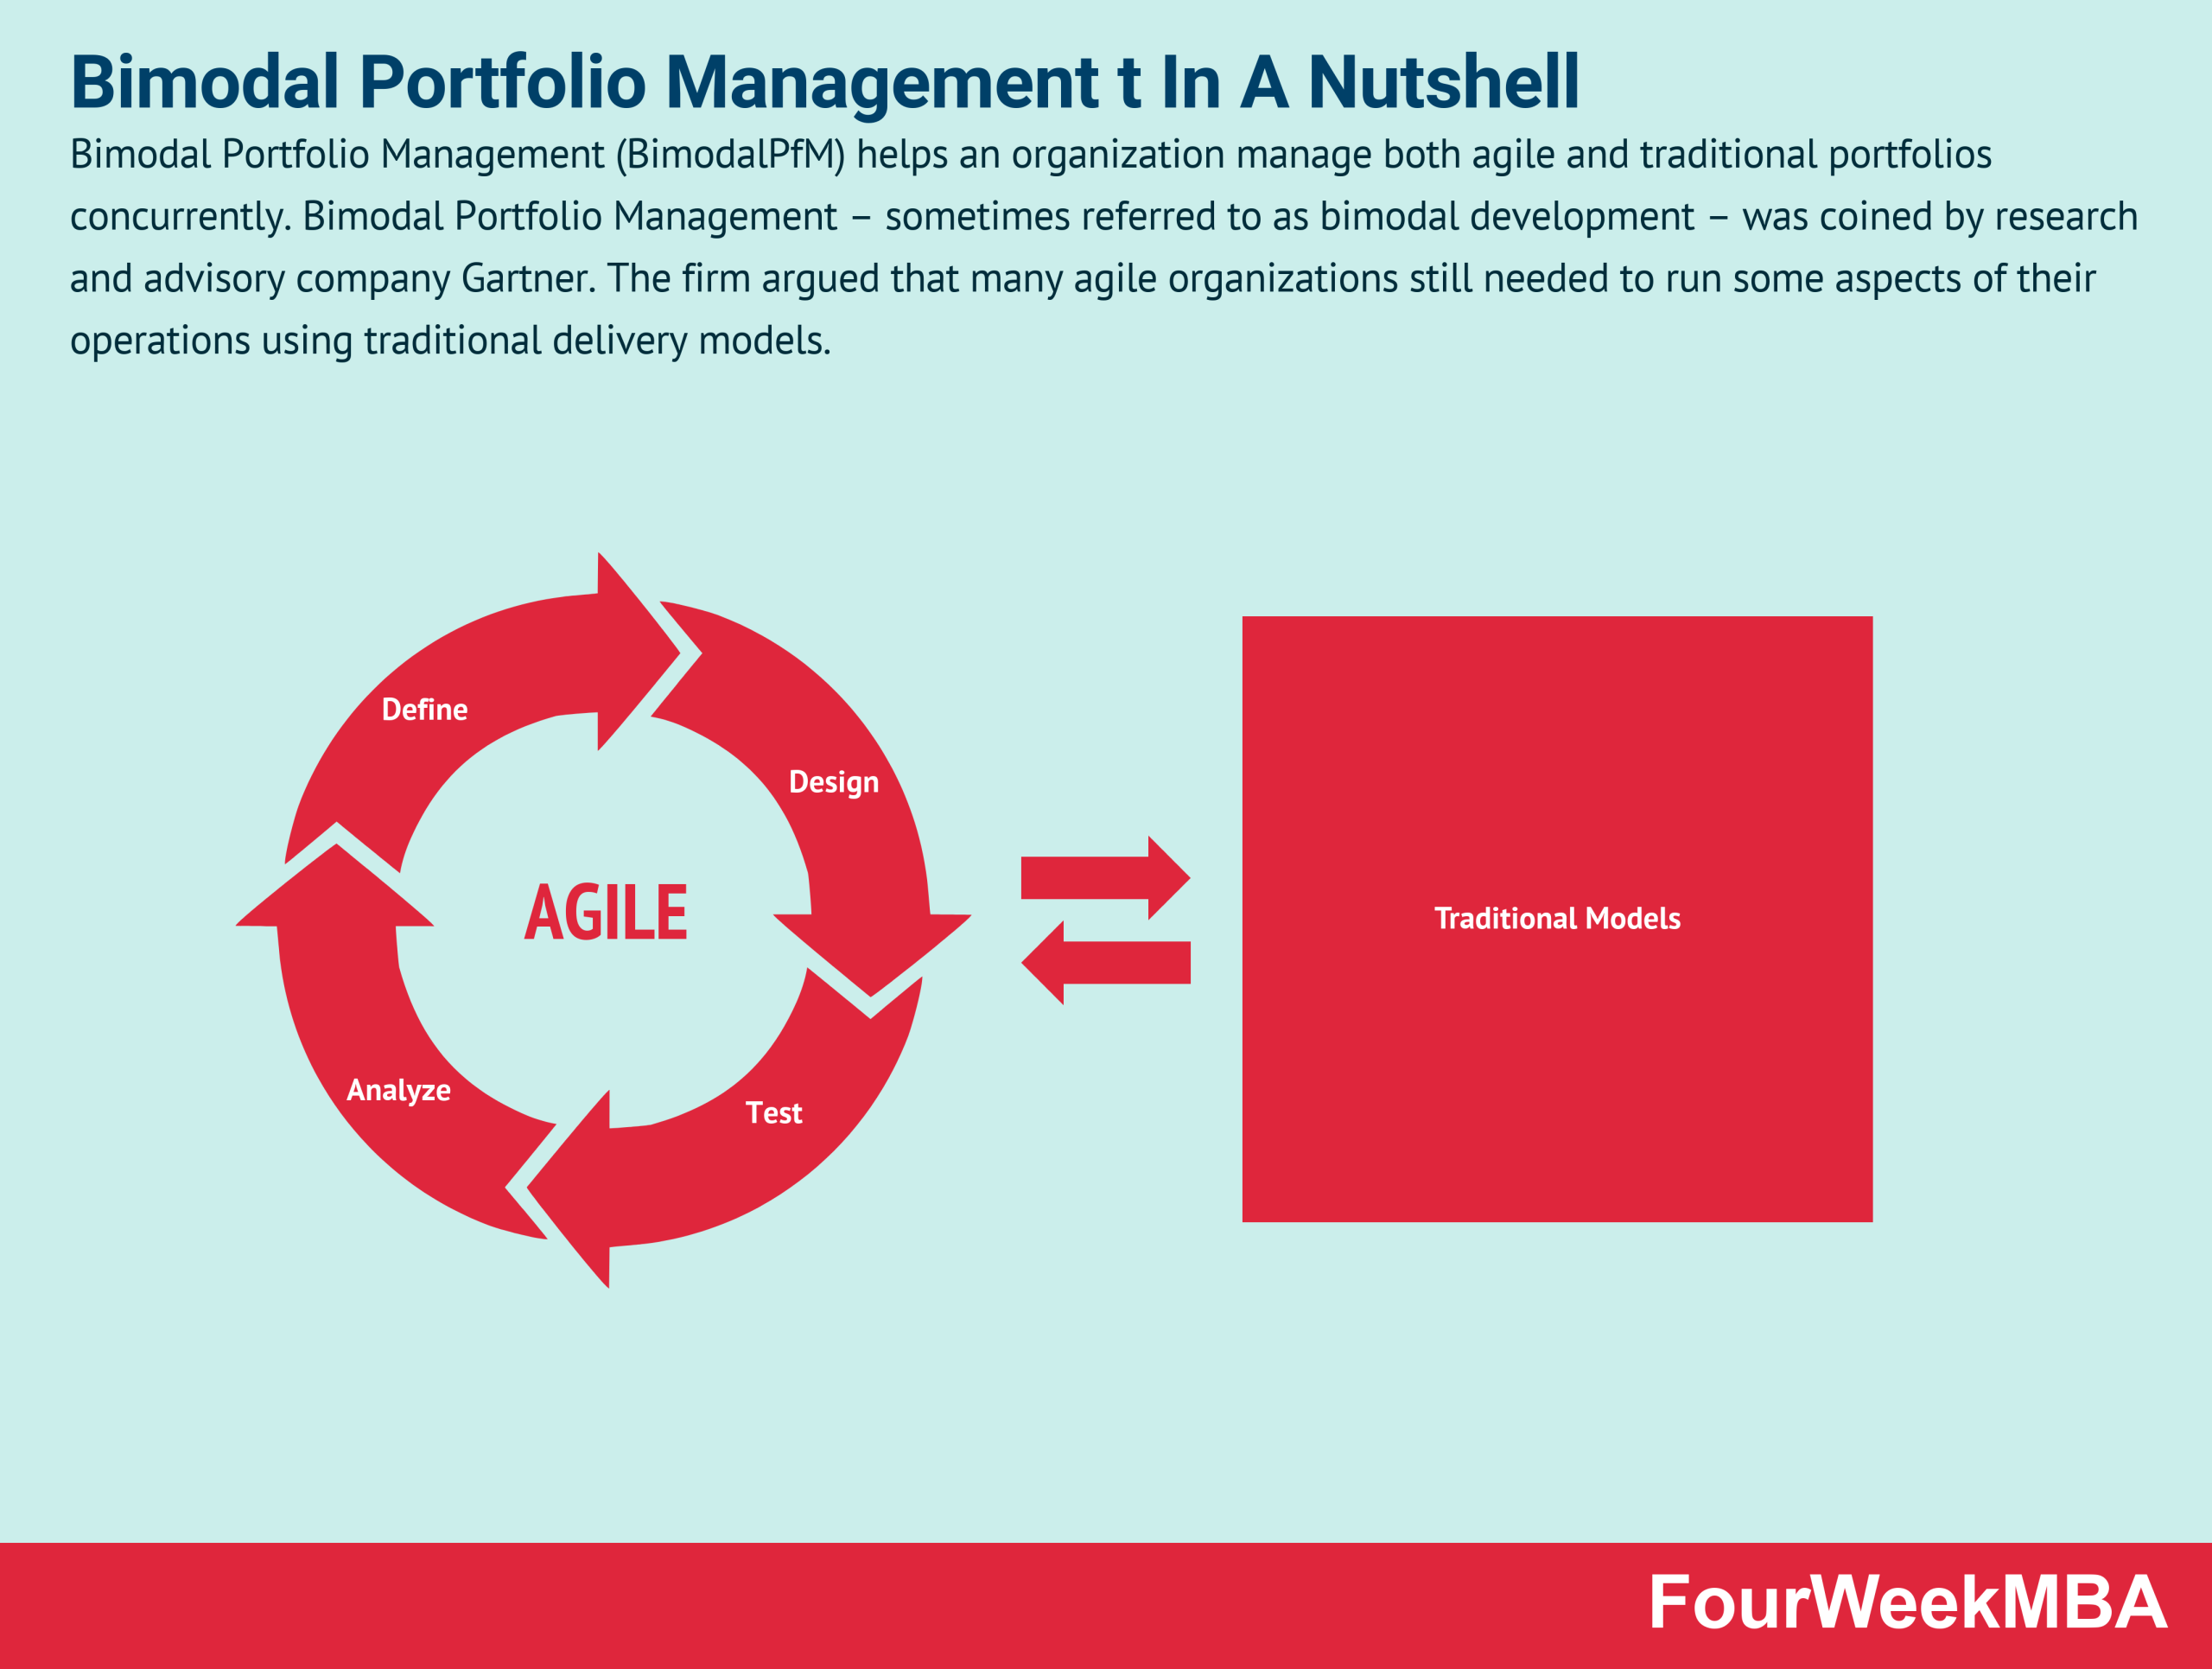 bimodal-portfolio-management